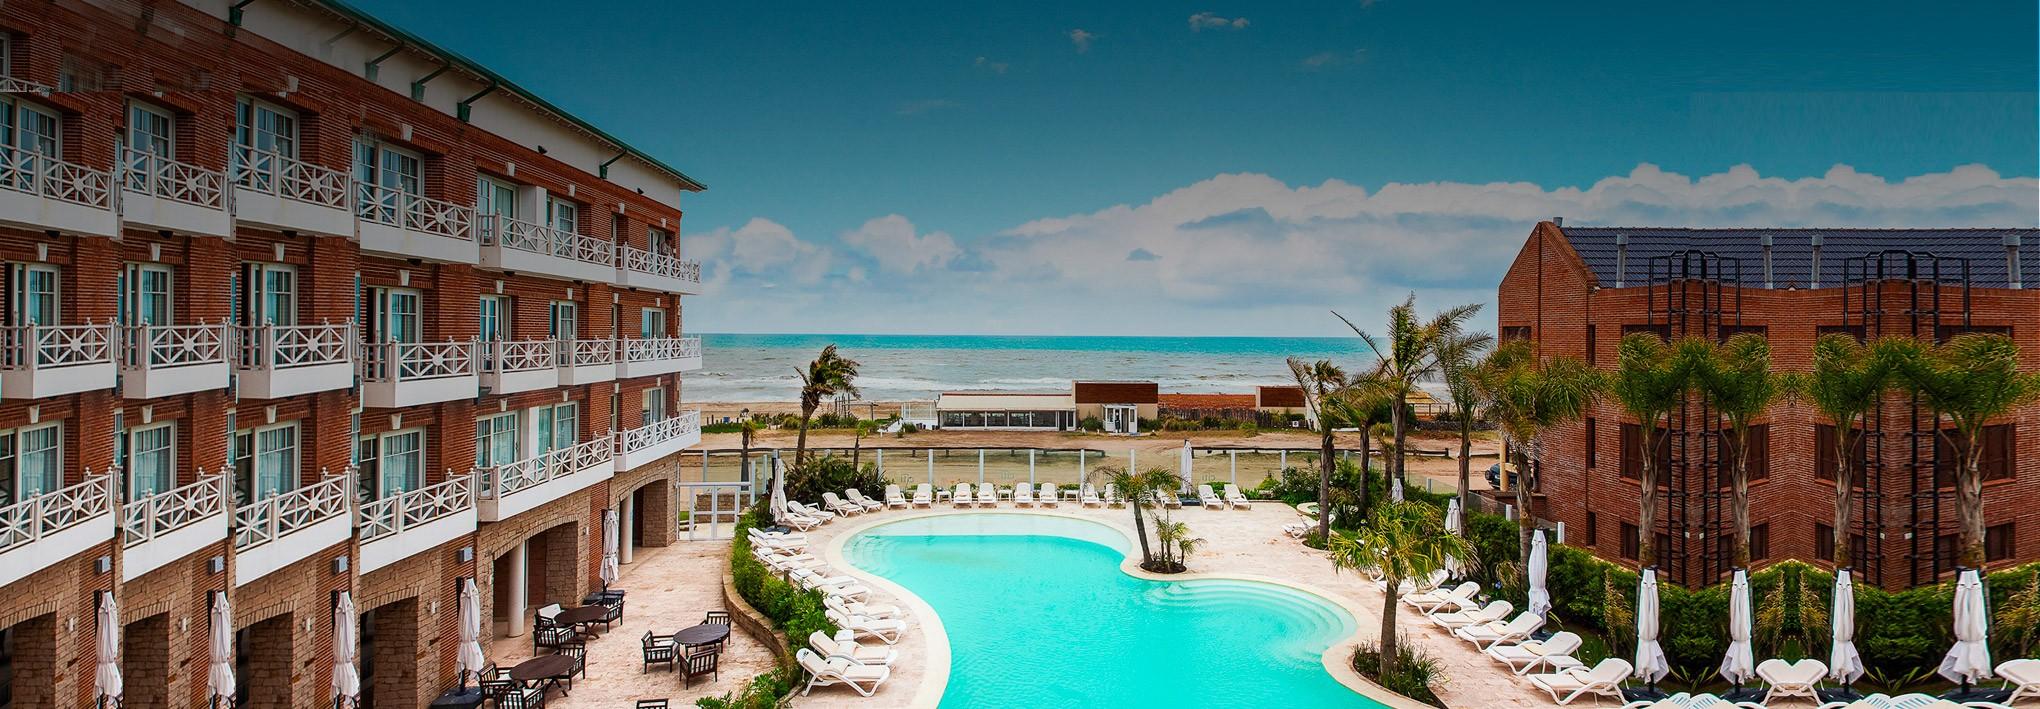 Terrazas Al Mar Apart Hotel Pinamar